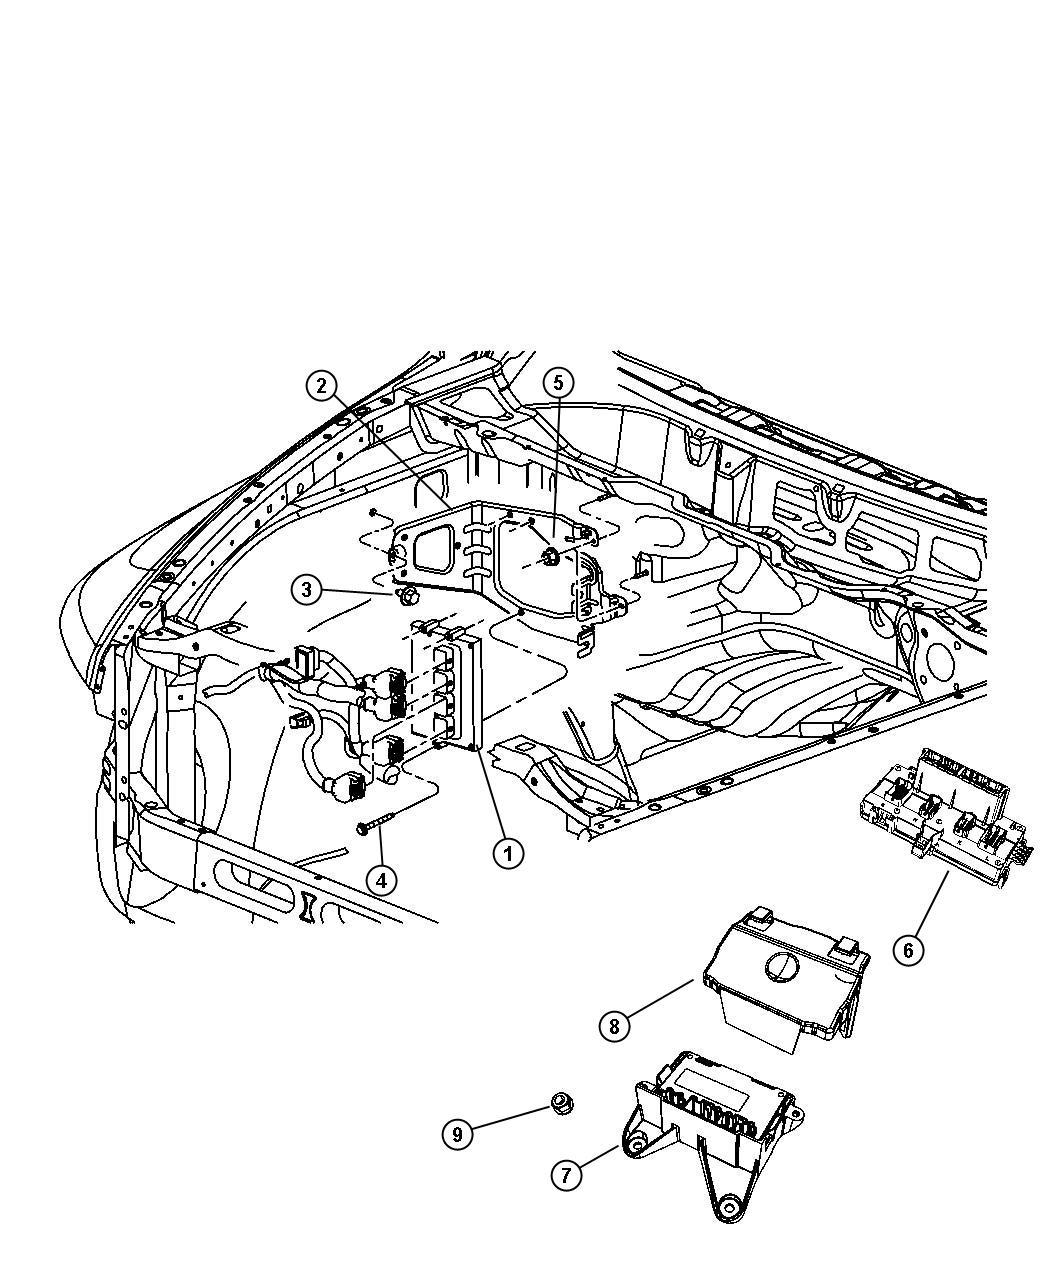 Dodge Ram 2500 Module. Powertrain control. Generic